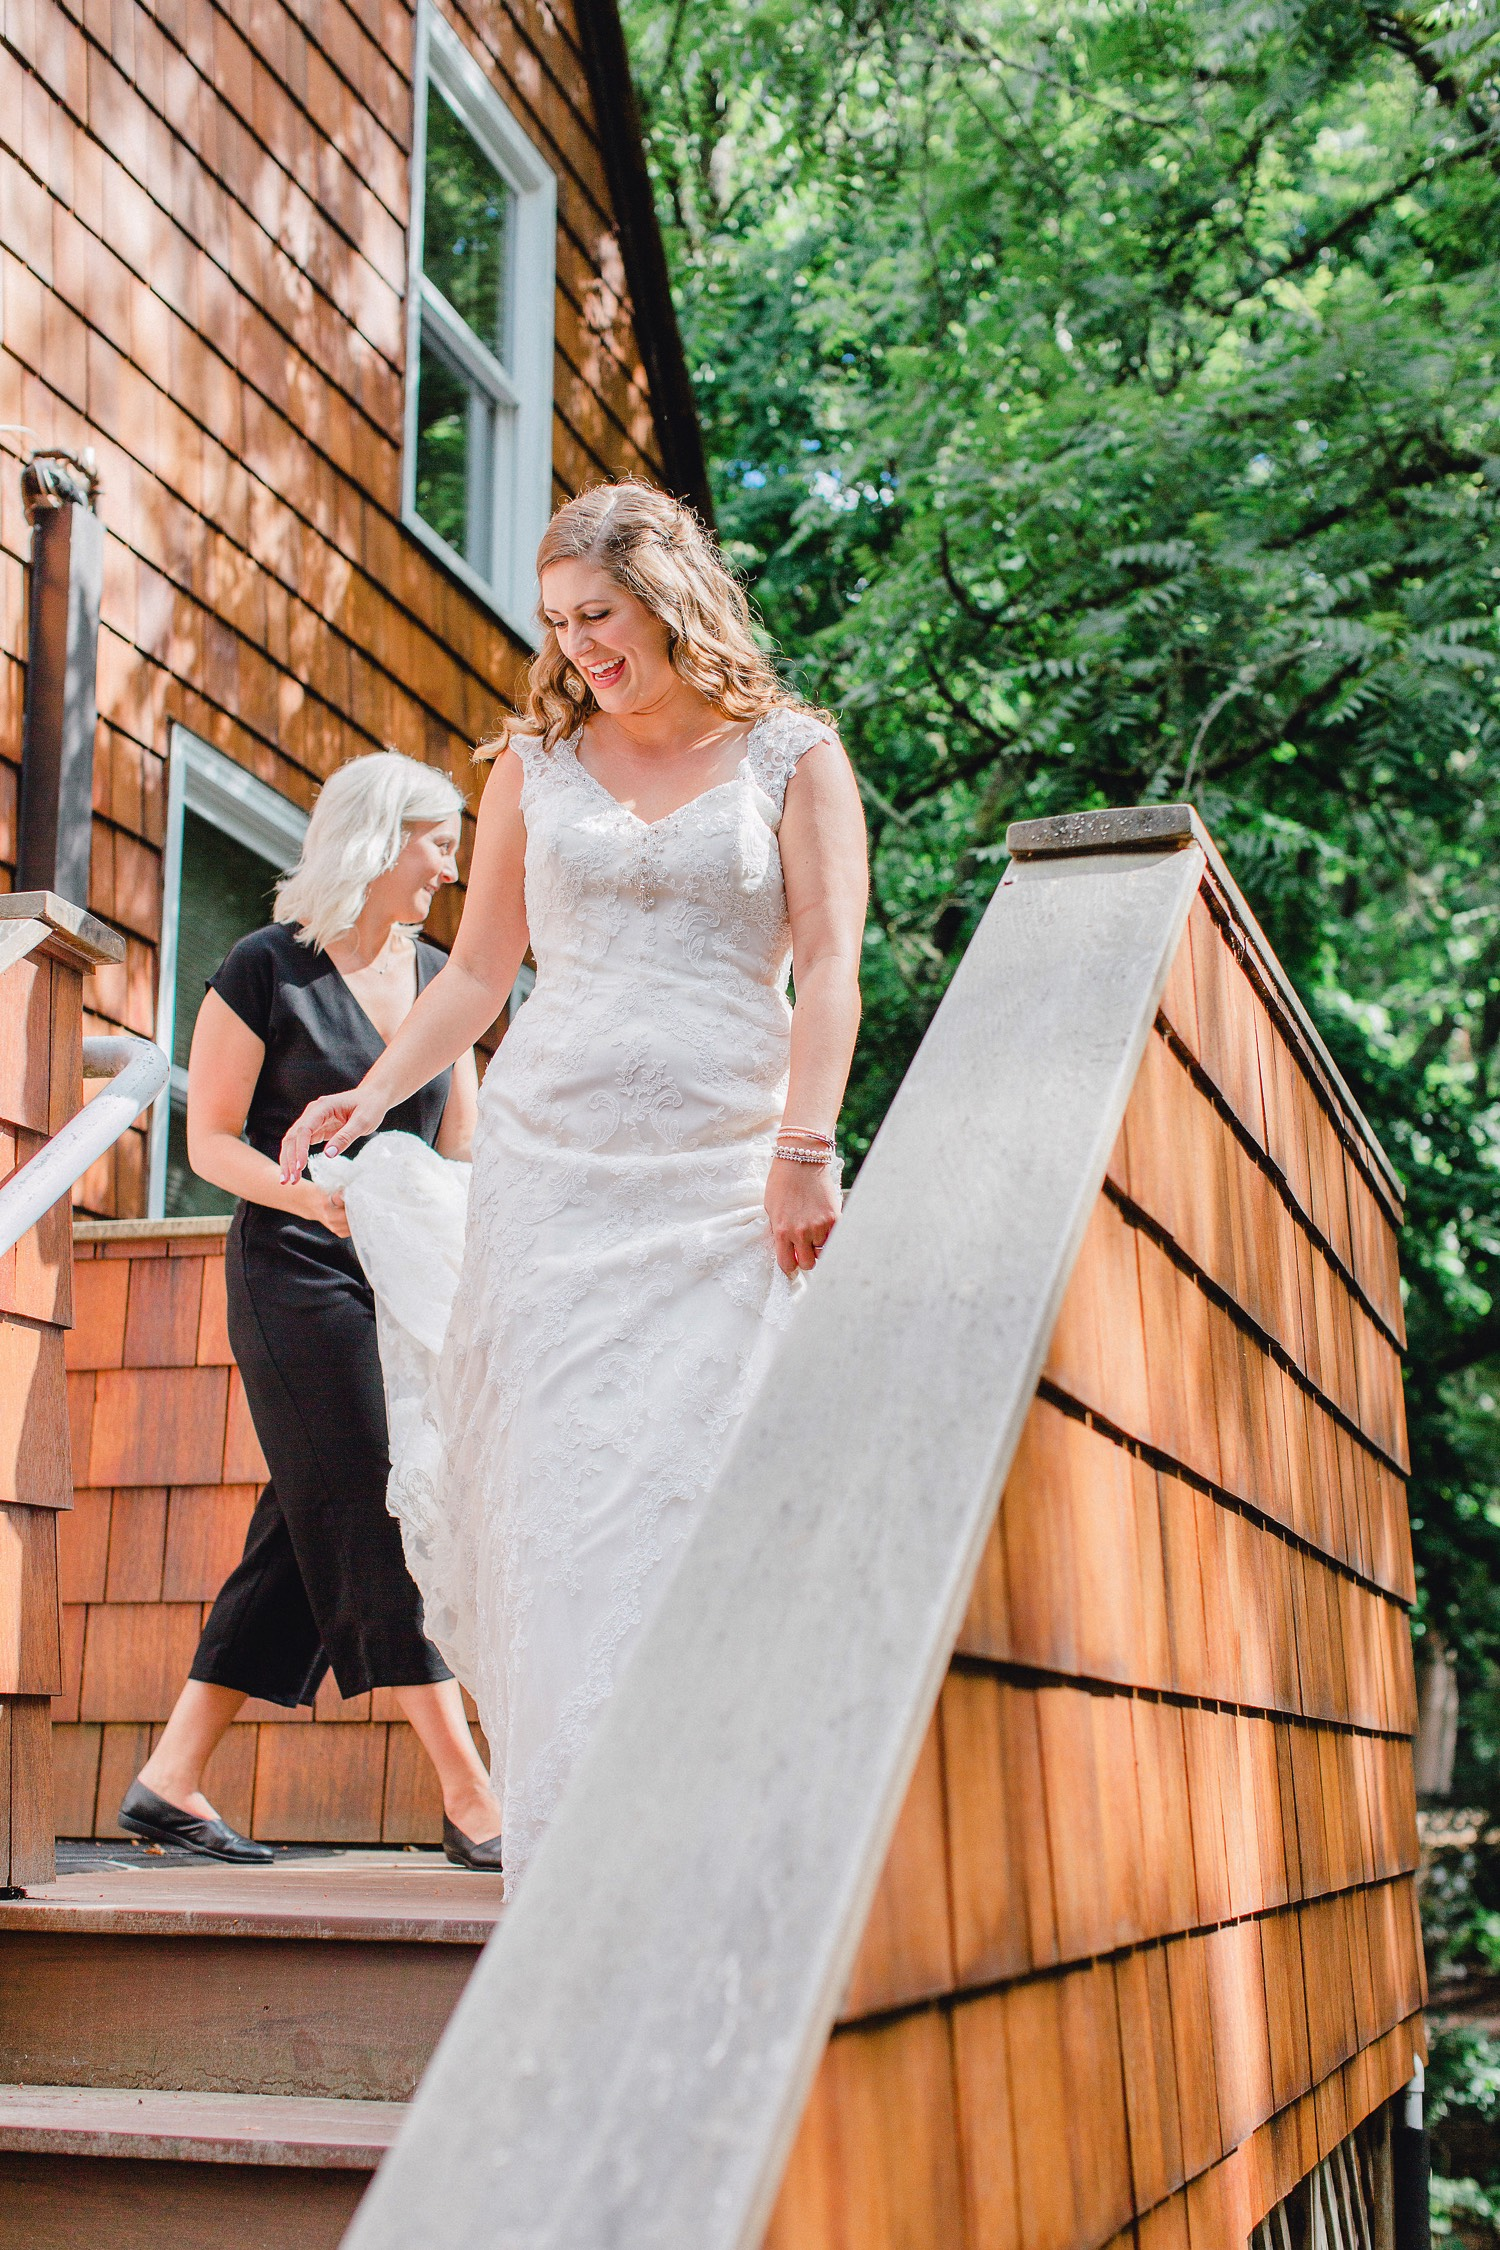 0000000000018_emmarosecompany_katiematt-9543_Photographer_PNW_House_Robinswood_Emma_Light_Company_Airy_Rose_and_Wedding_Seattle.jpg